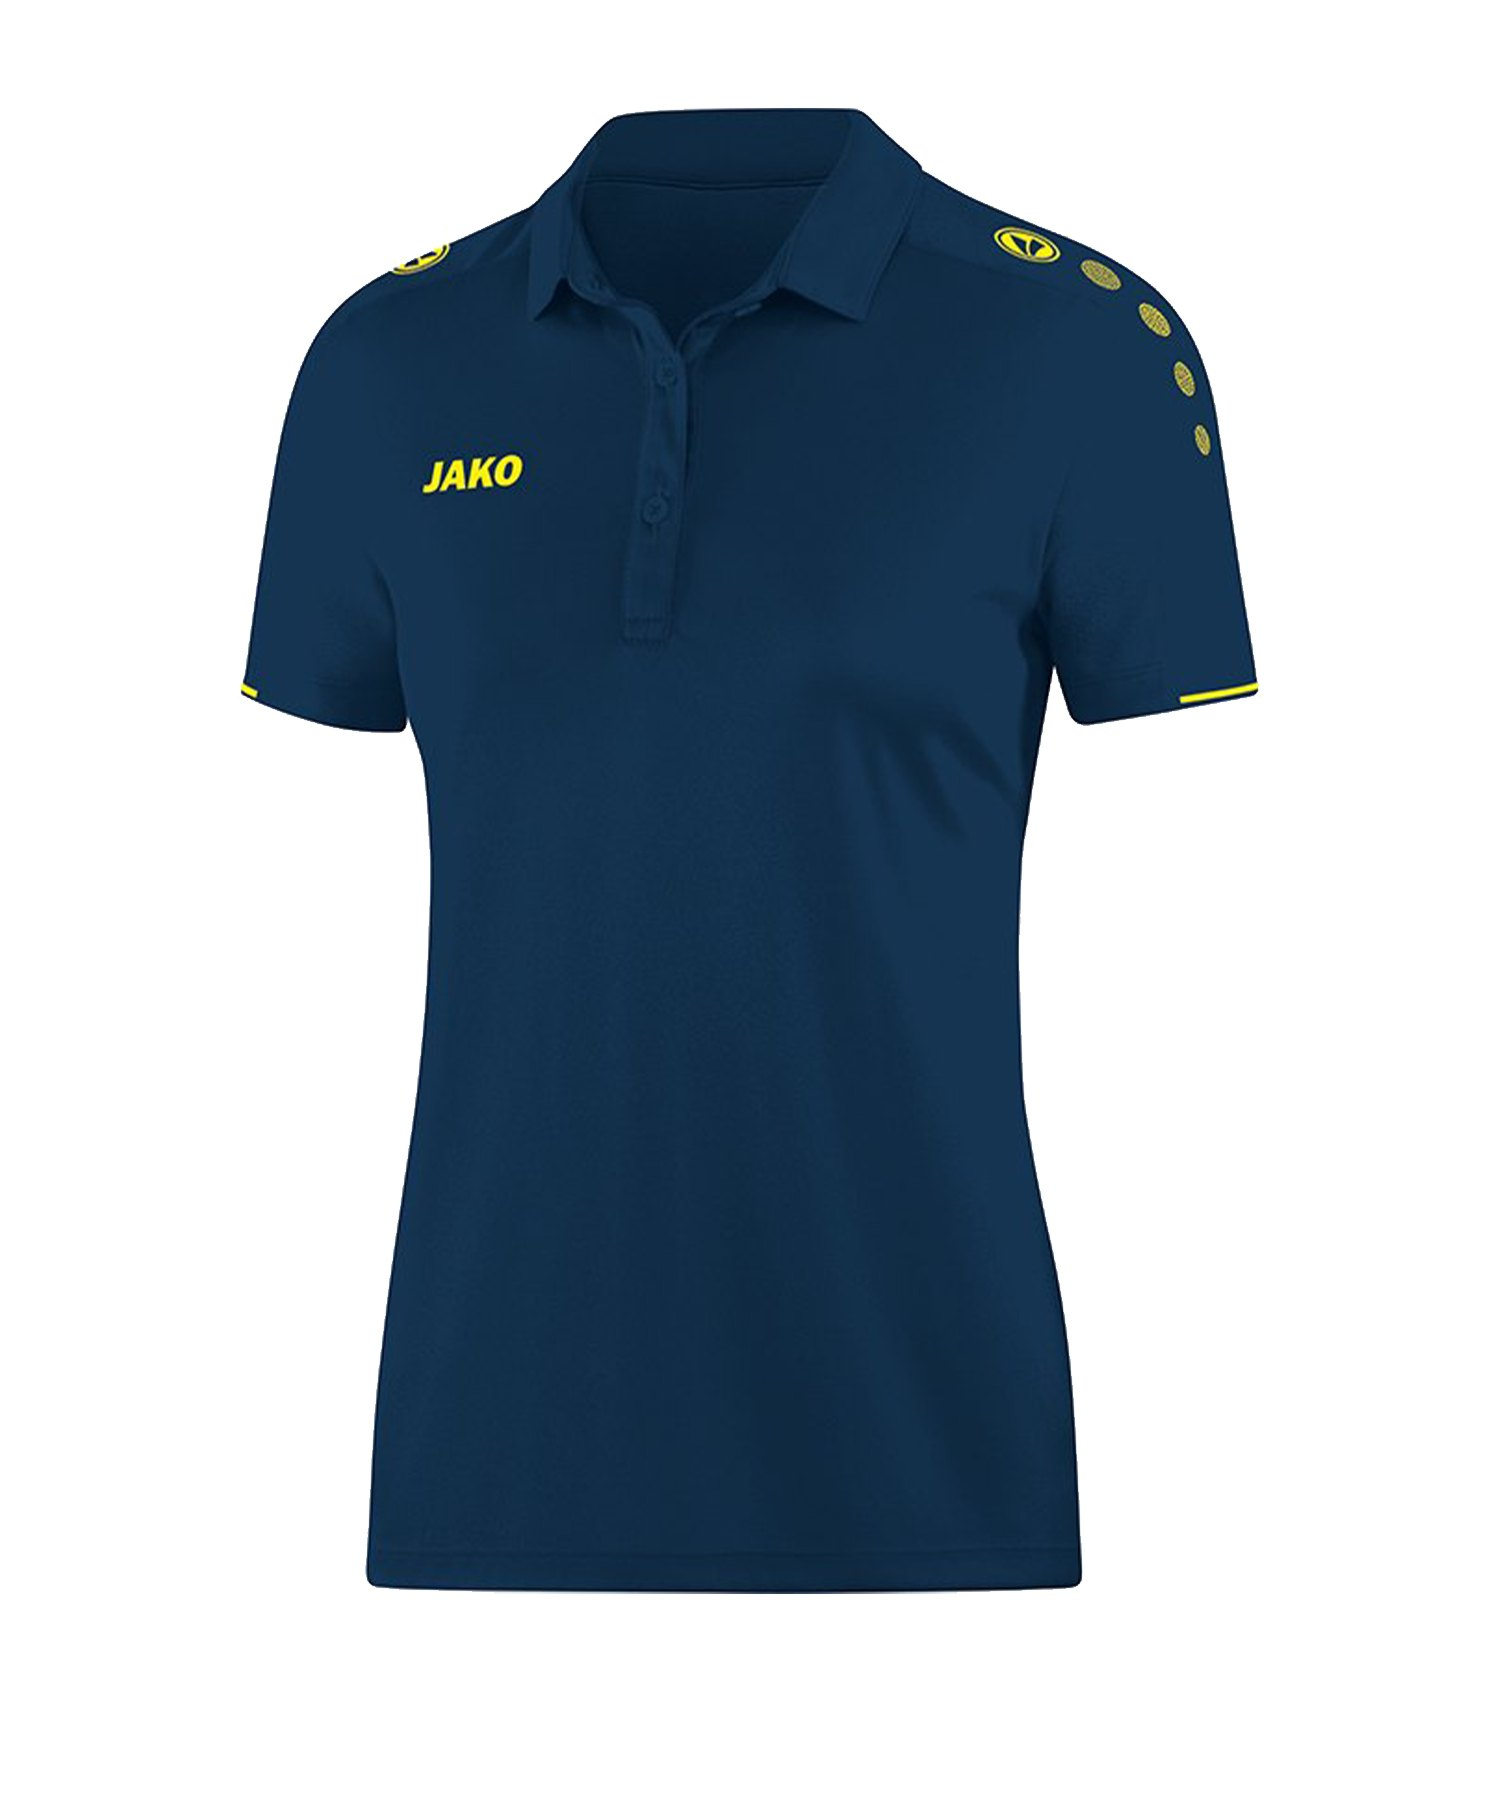 Jako Classico Poloshirt Damen Blau Gelb F42 - Blau